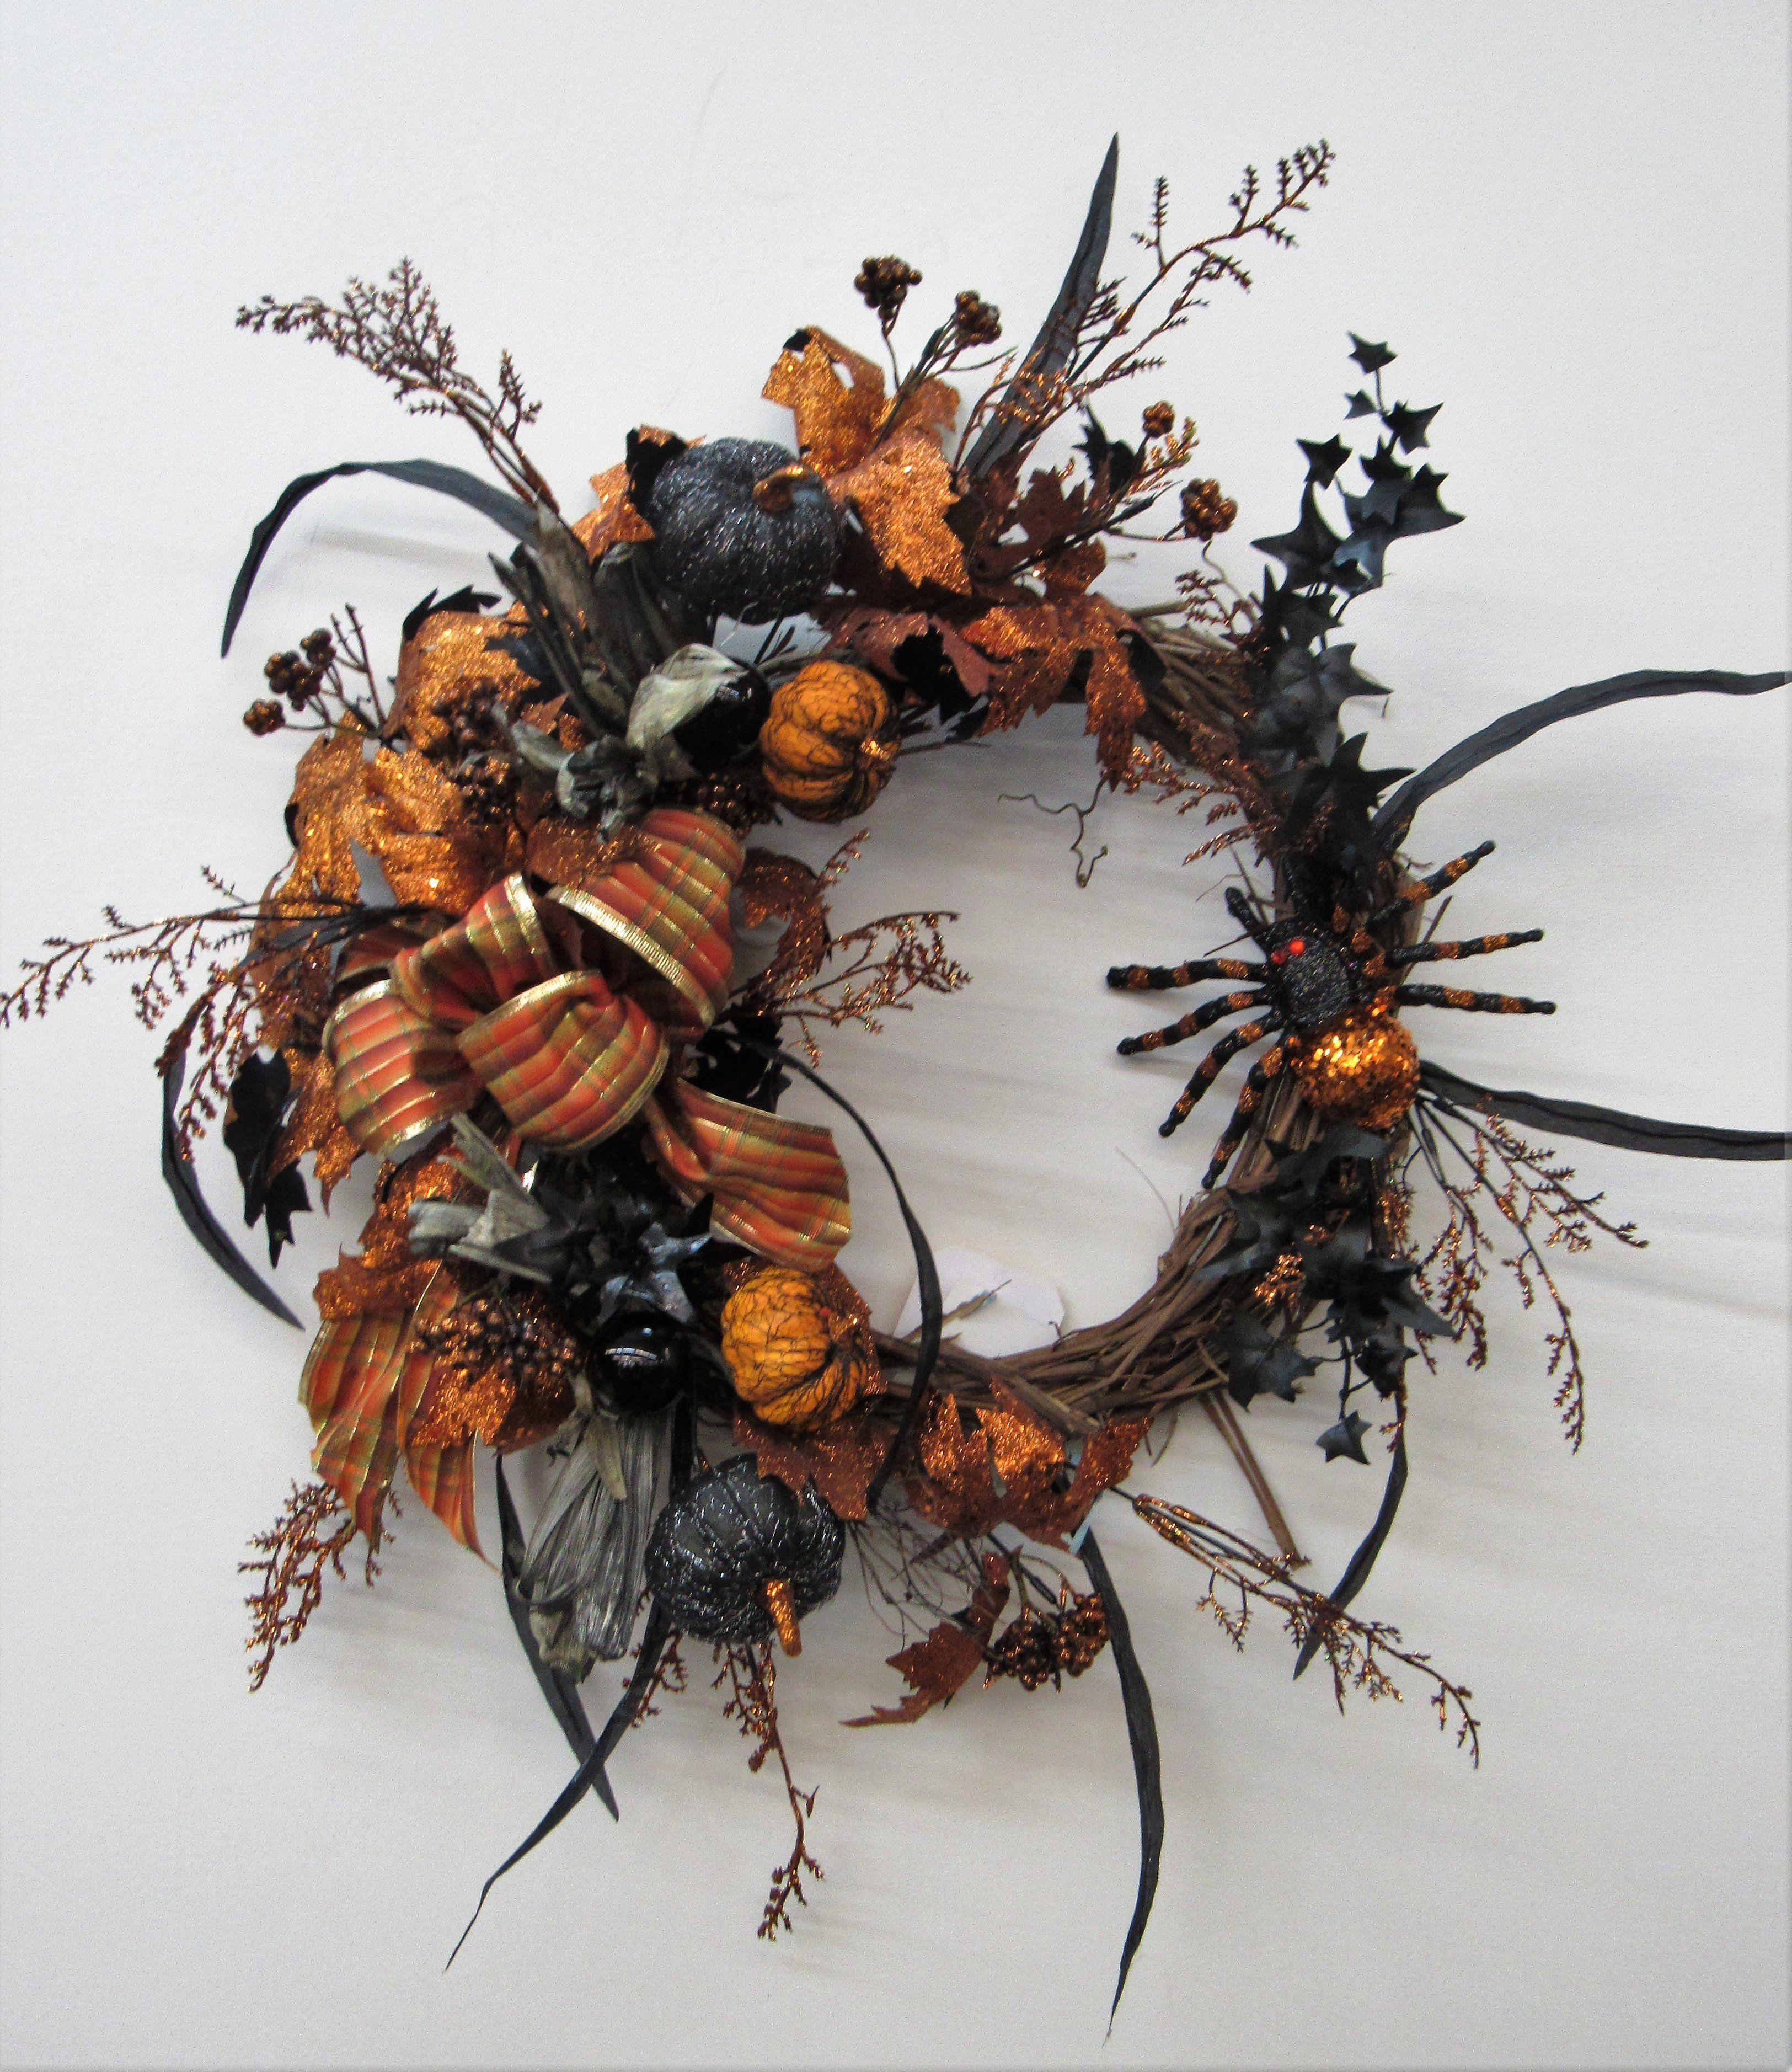 Orange And Black Silk Floral Halloween Crescent Wreath With Spider Pumpkins Hal25 Scary Halloween Wreath Halloween Door Wreaths Halloween Wreath